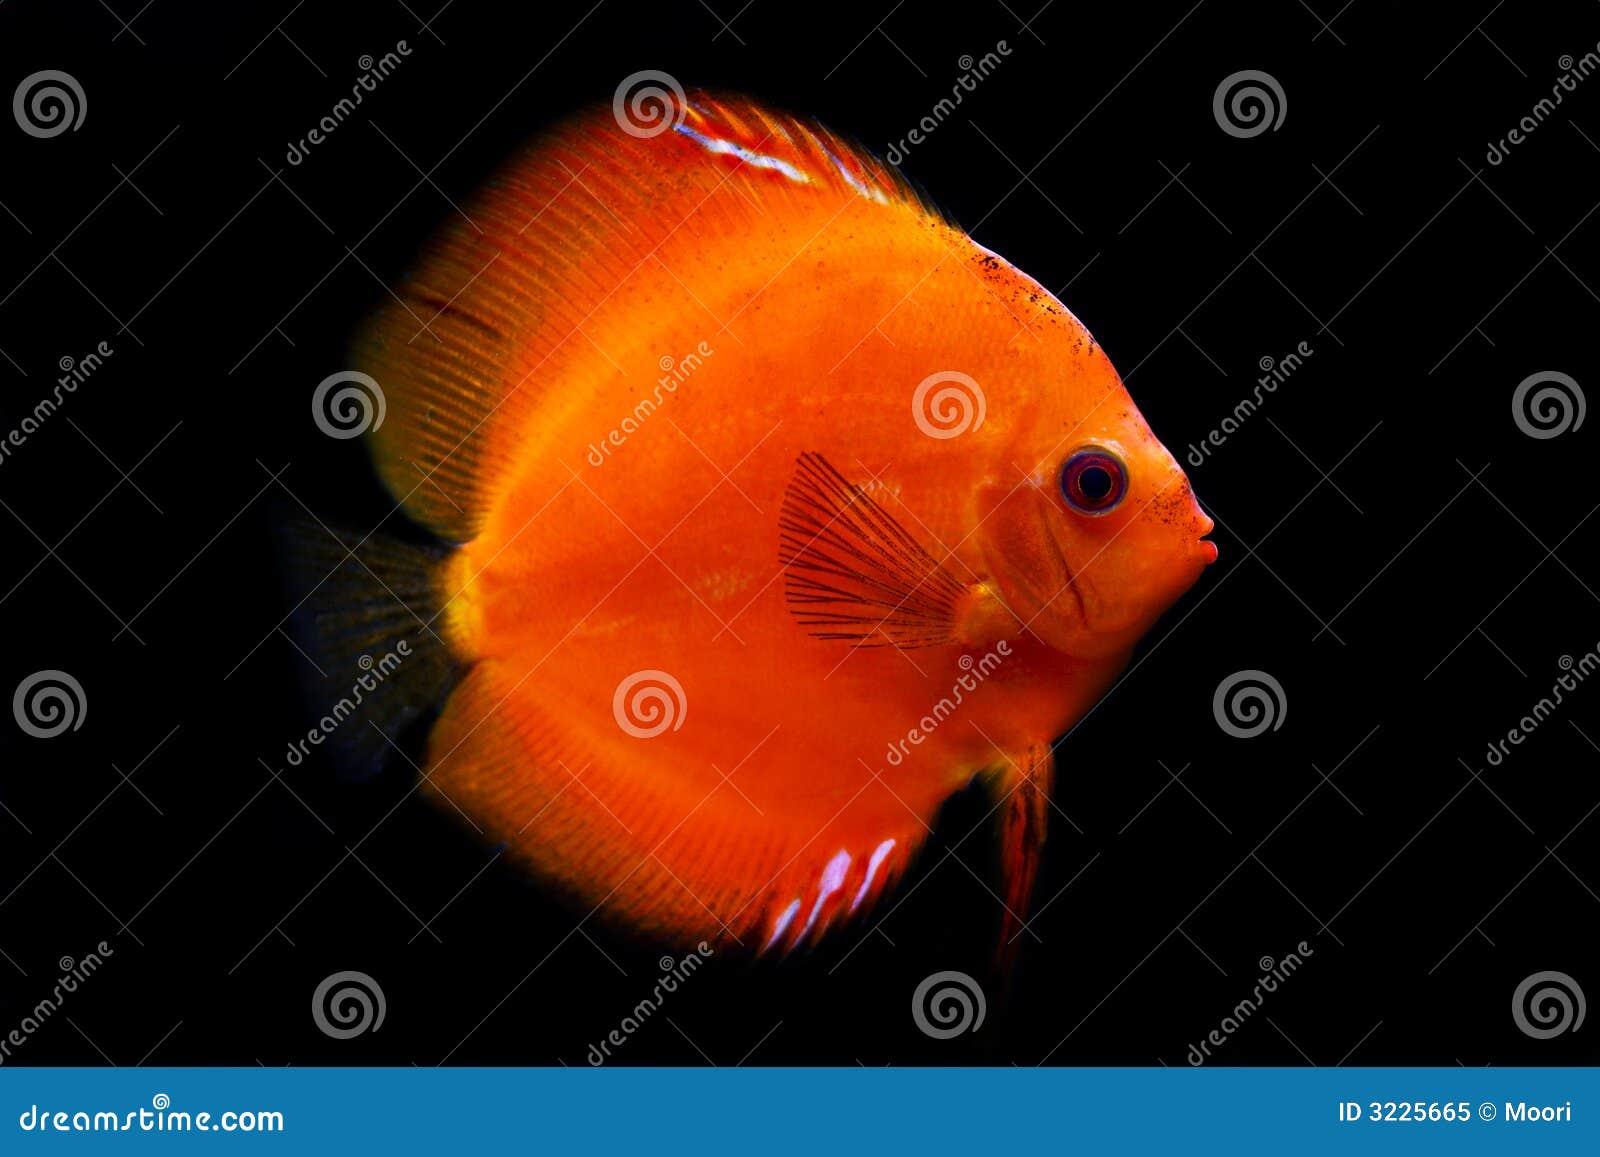 Colorful Tropical Discus Fish Stock Image - Image of aquarium, deep ...